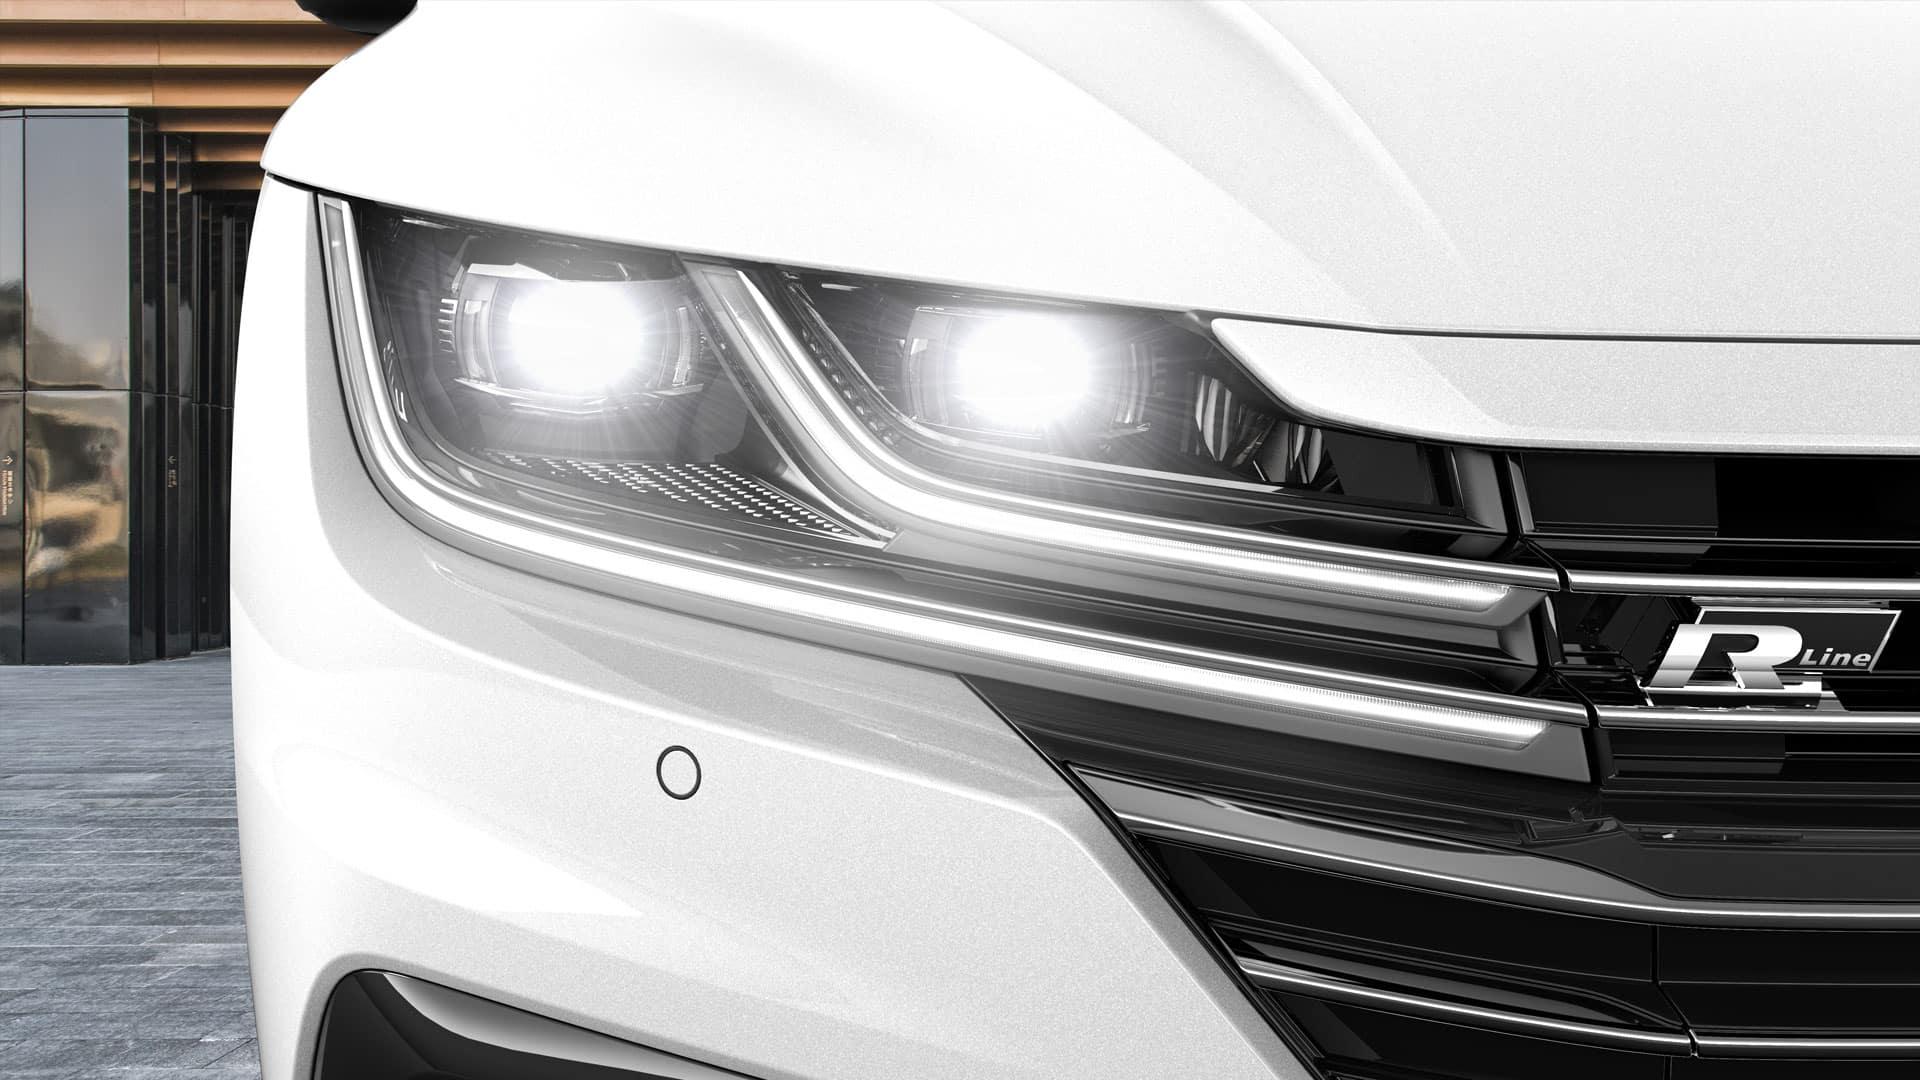 2019 VW Arteon LED headlights